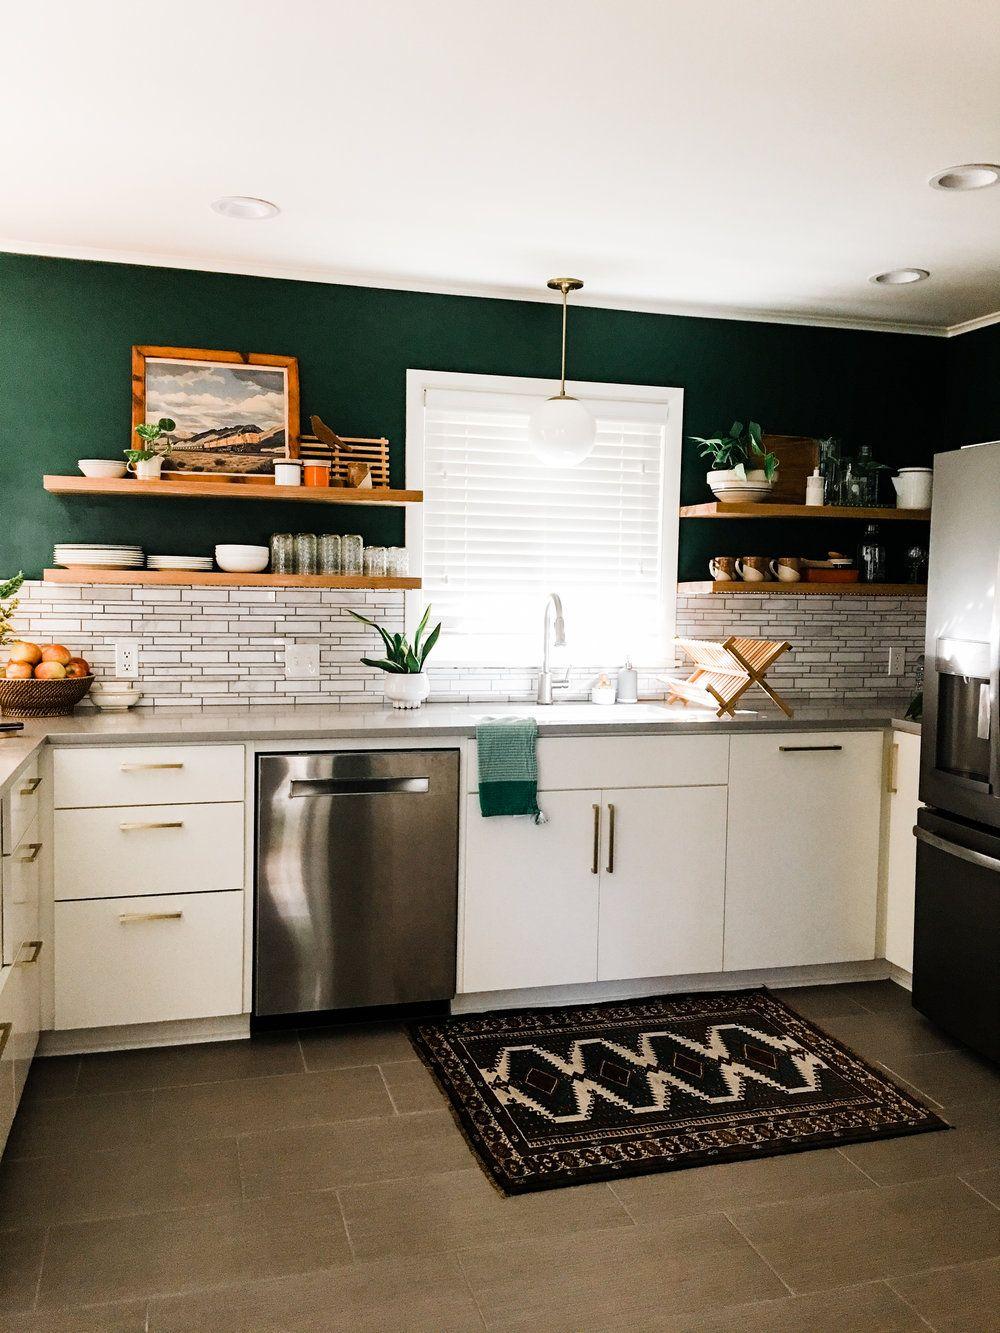 Colorful Vintage Modern Kitchen Renovation In Tulsa Ok Retro Den Vintage Furniture And Homewares Modern Kitchen Renovation Kitchen Design Small Kitchen Dining Room Combo